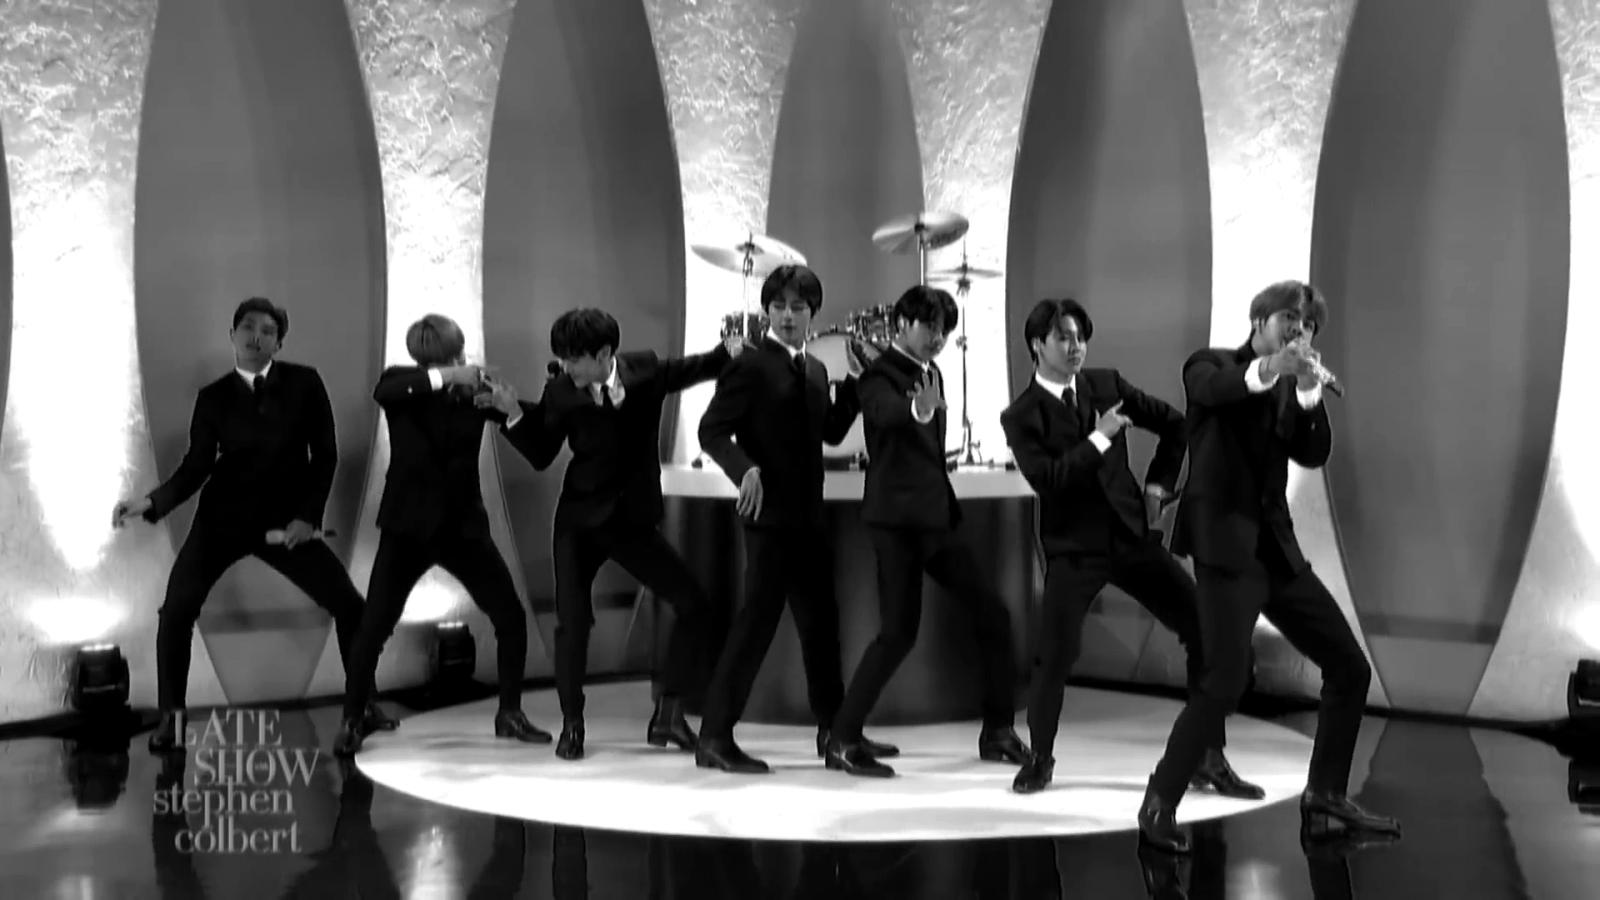 How BTS became the world's biggest boy band - CNN